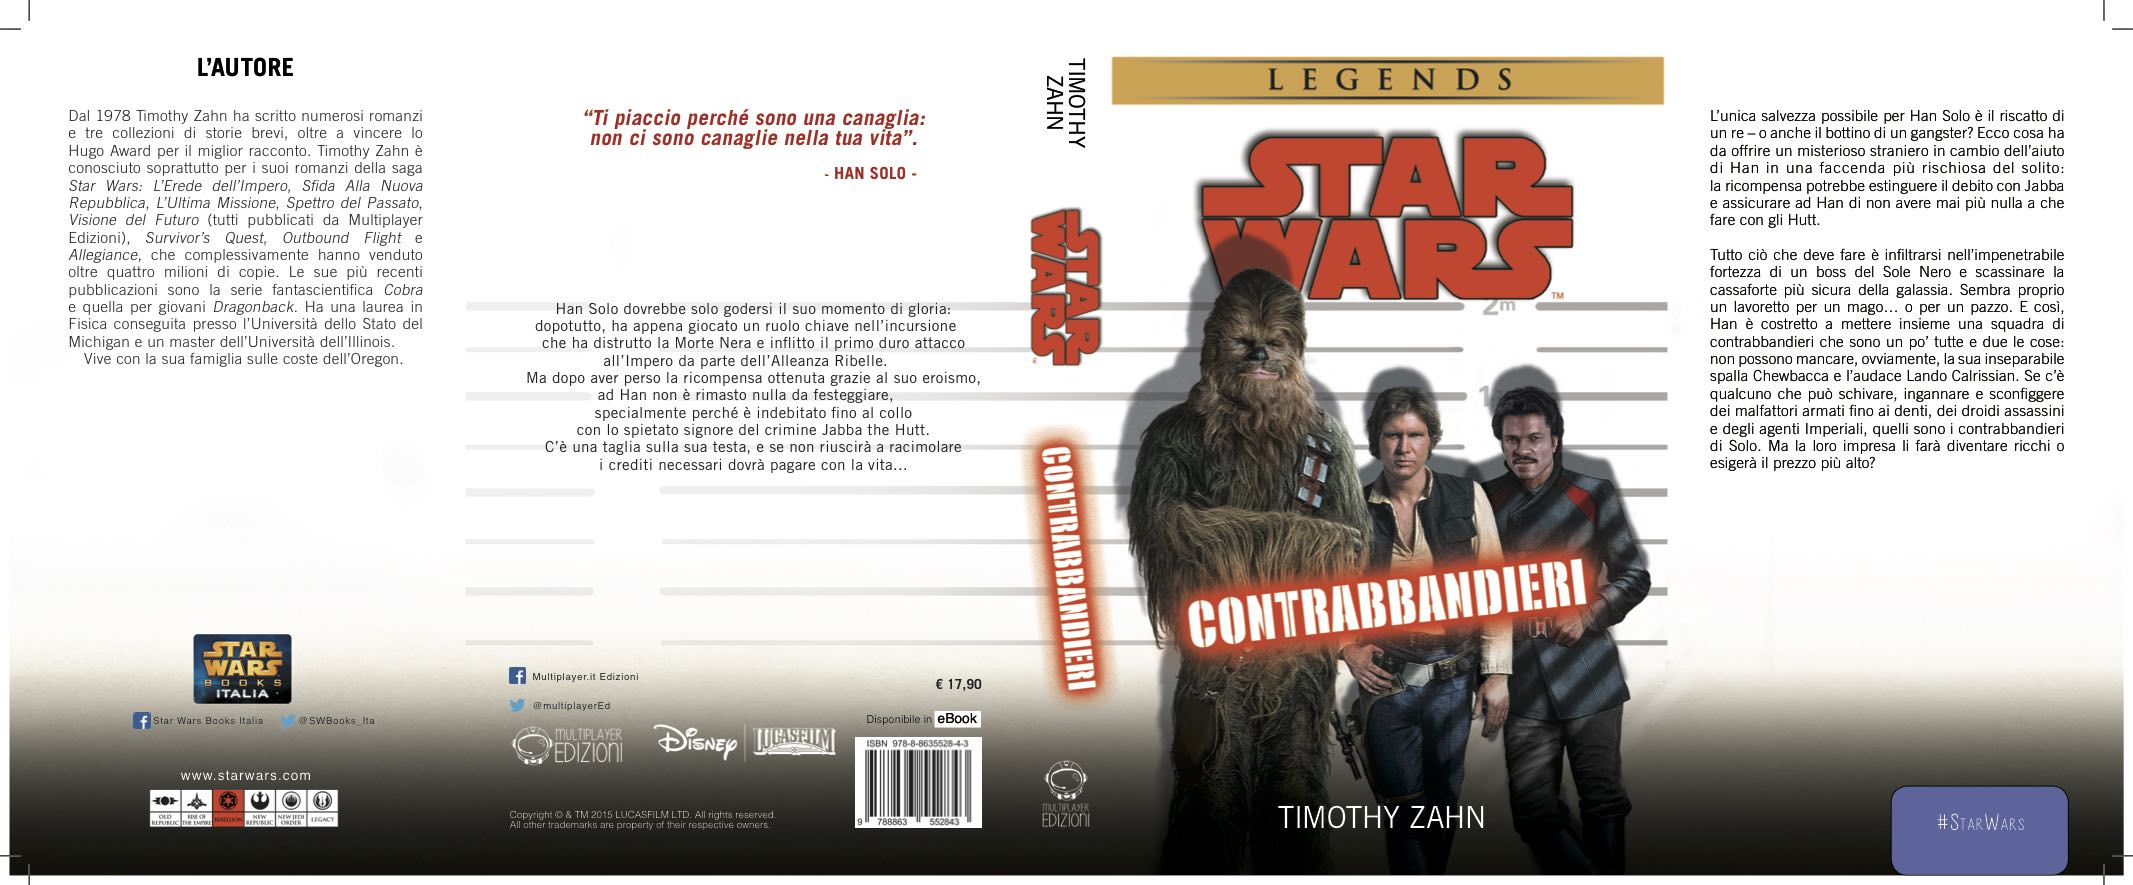 StarWars-Contrabbandieri-Copertina